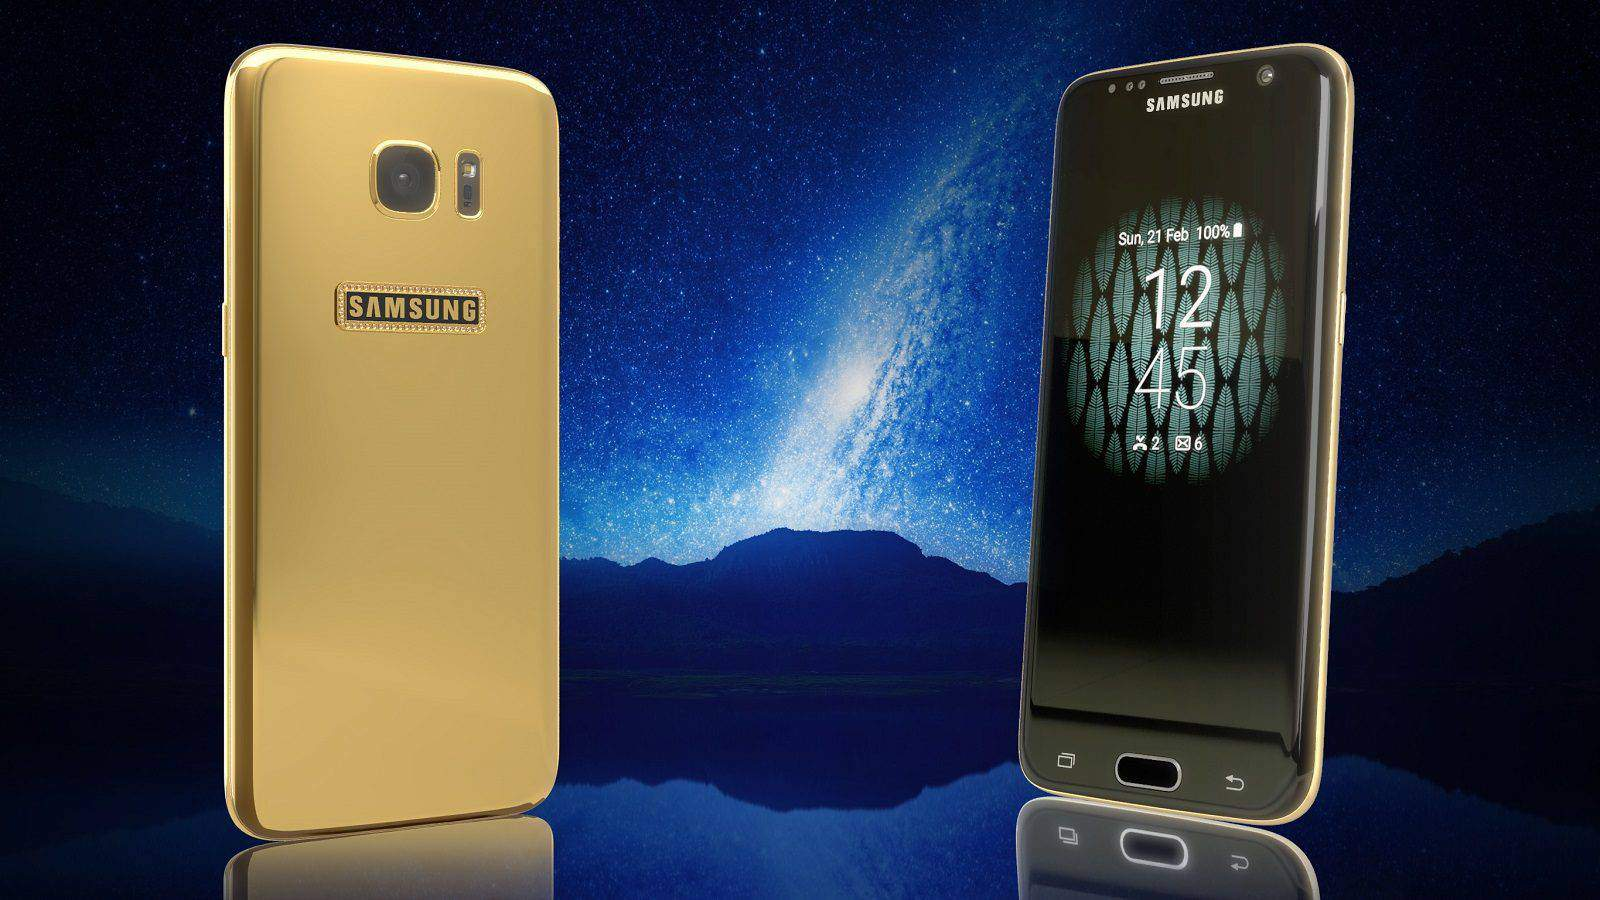 Galaxy S7 EDGE Legend official image KK